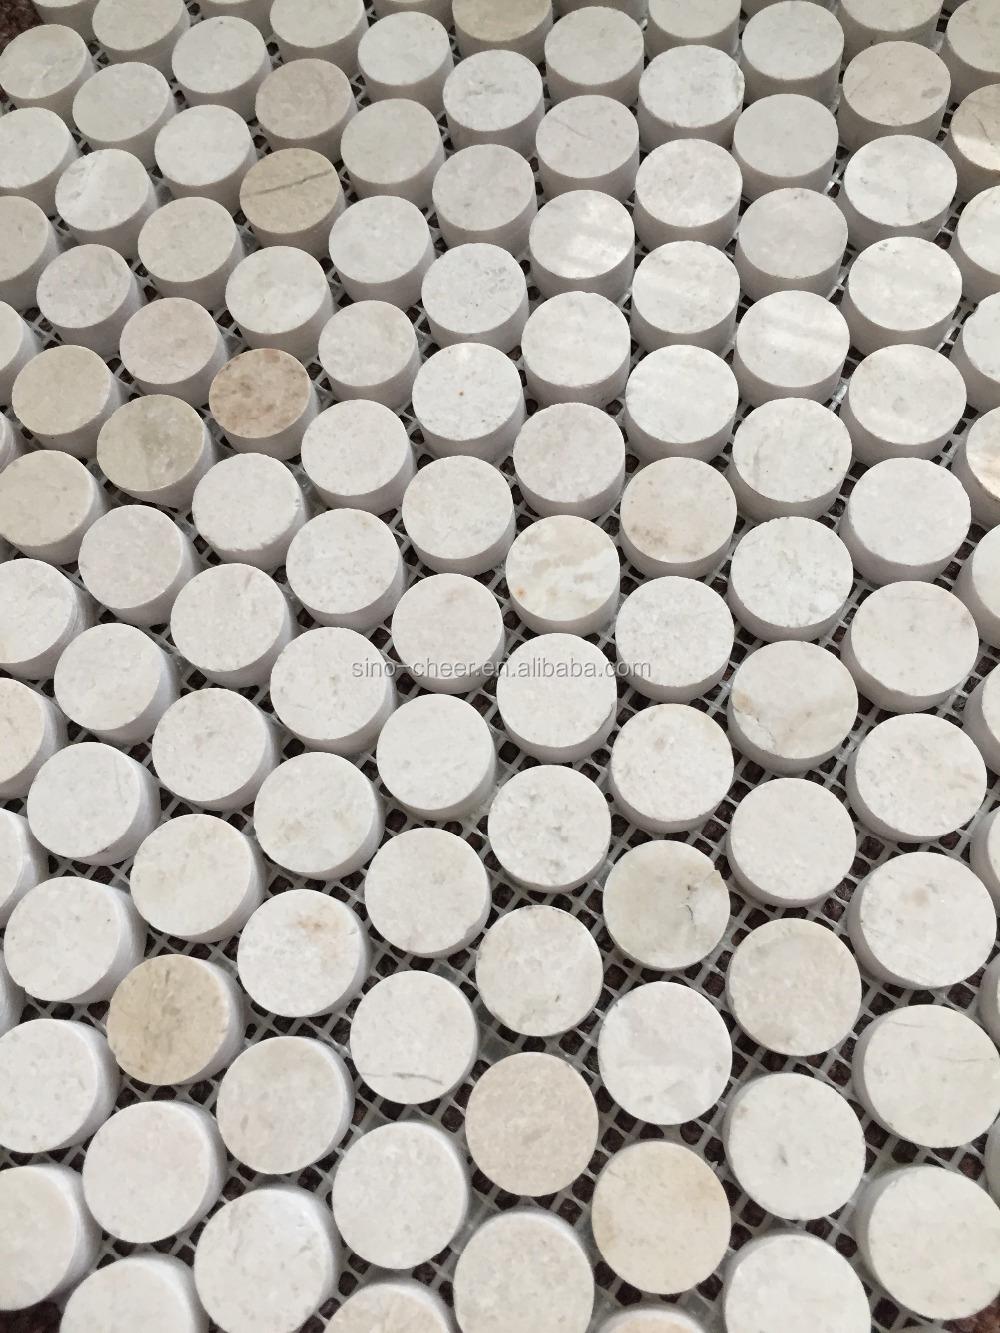 Circle Tiles Crema Marfil Circle Stone Mosaic Tiles Buy Beige Penny Round